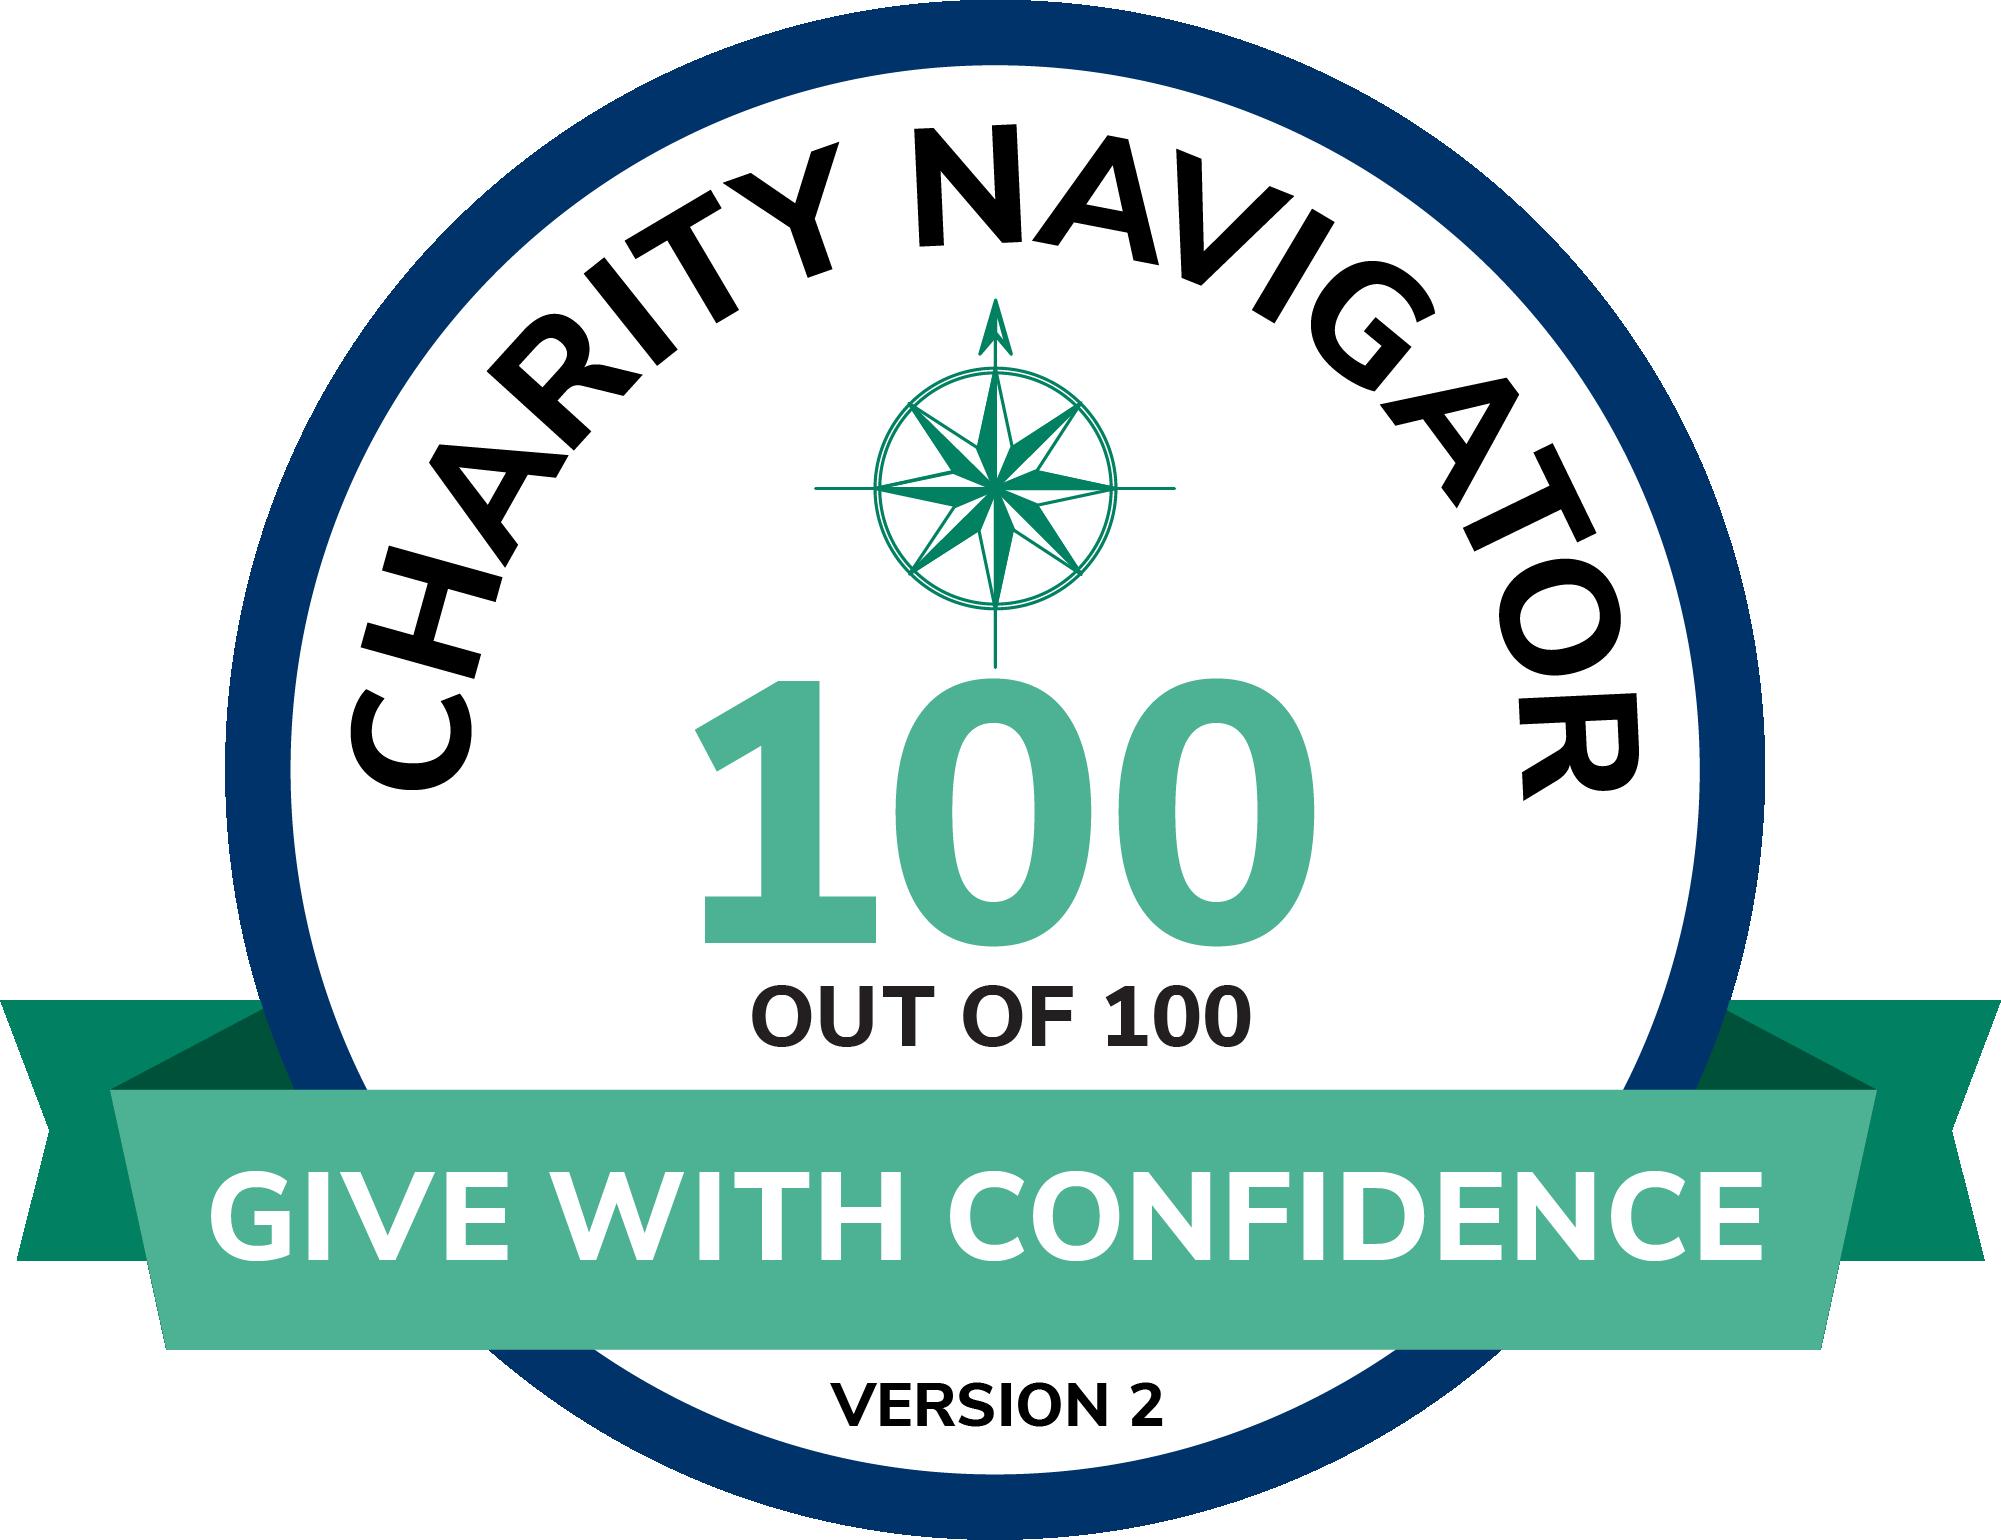 CharityNav